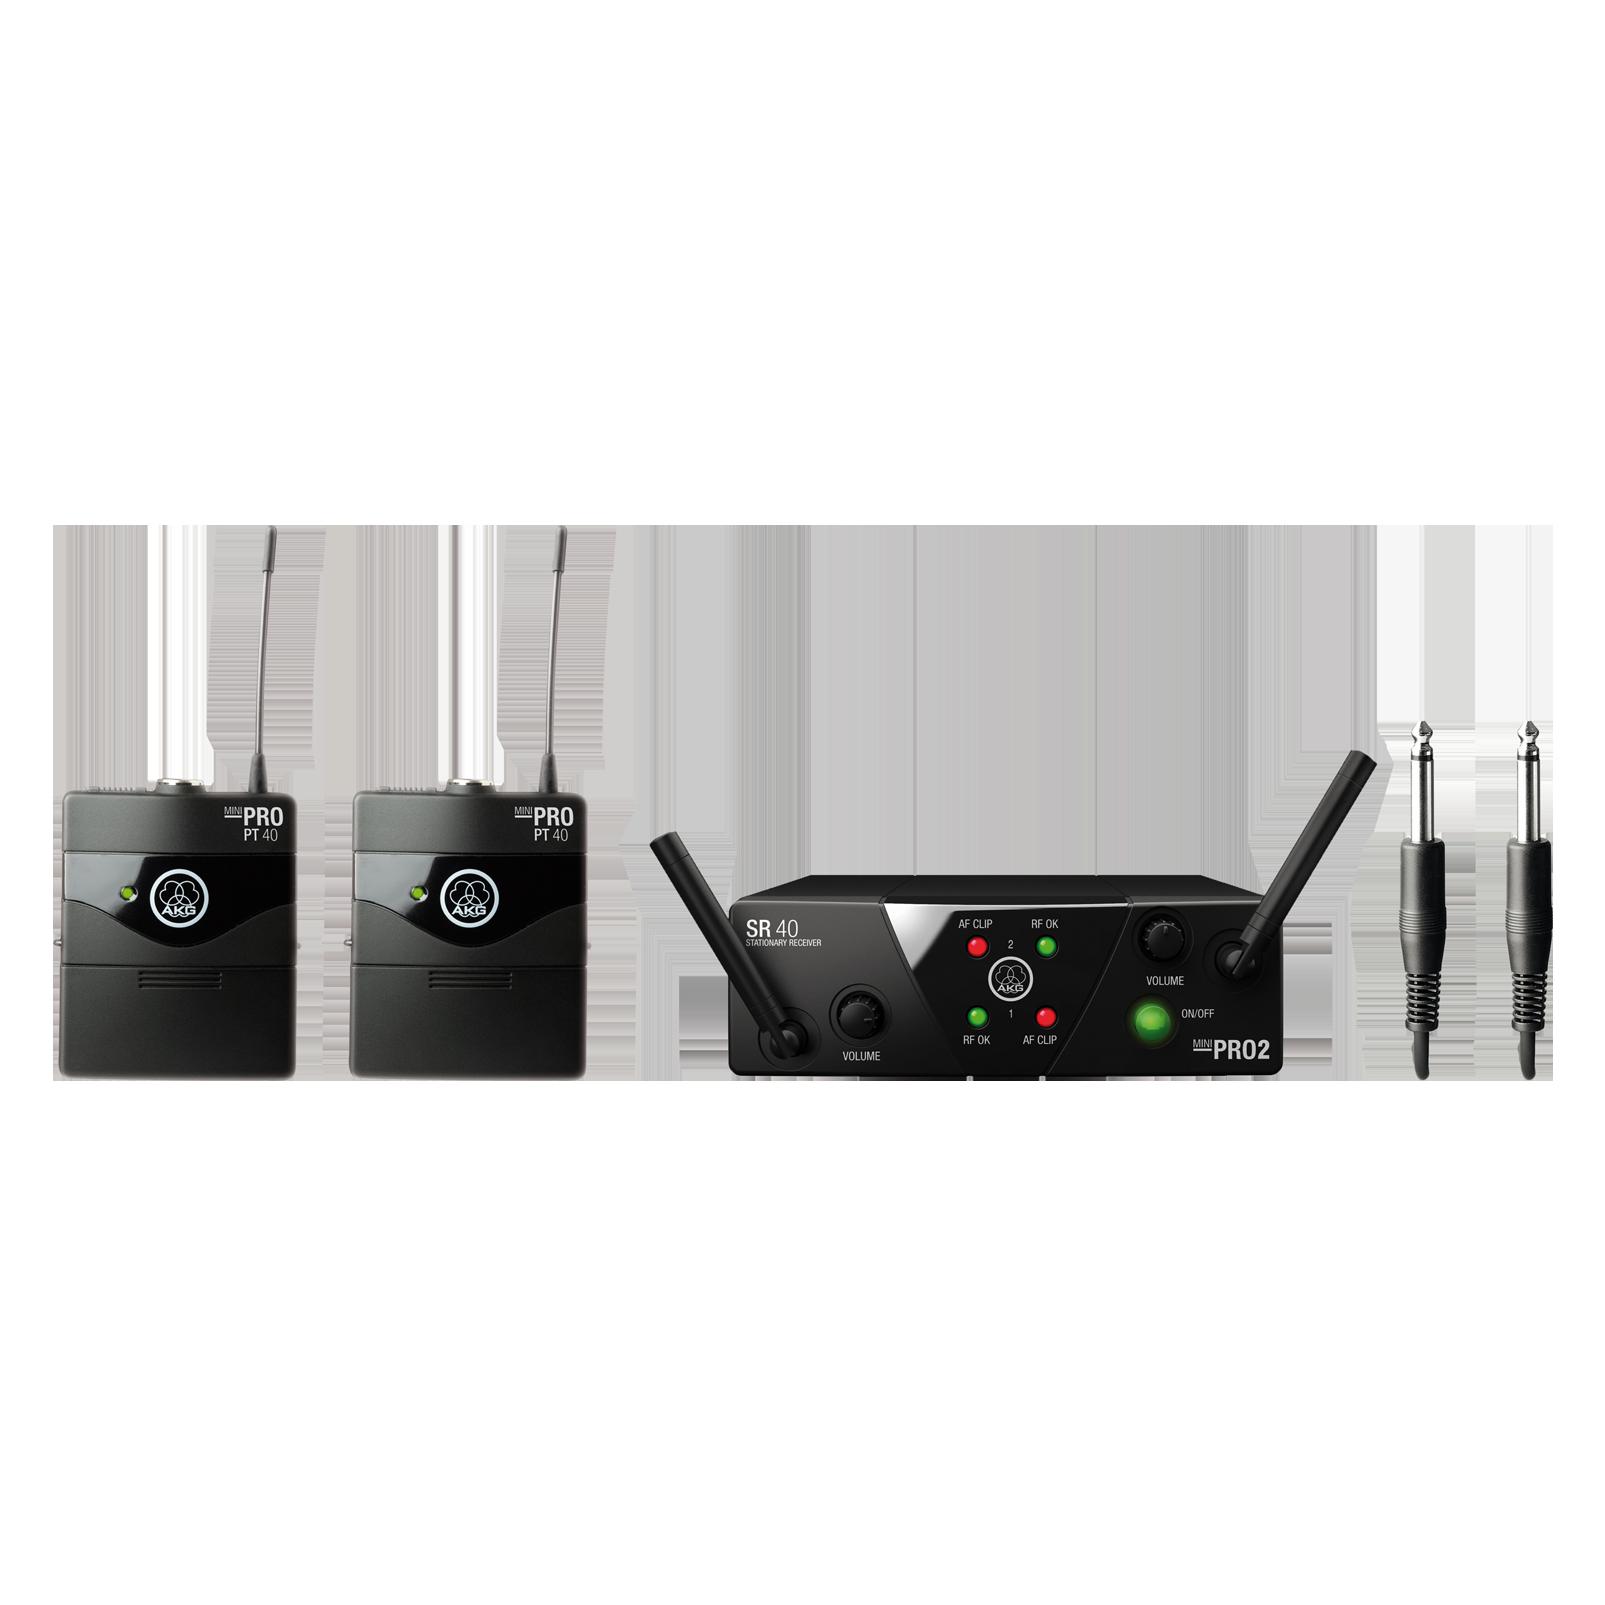 WMS40 Mini Dual Instrumental Set - Black - Wireless microphone system - Hero